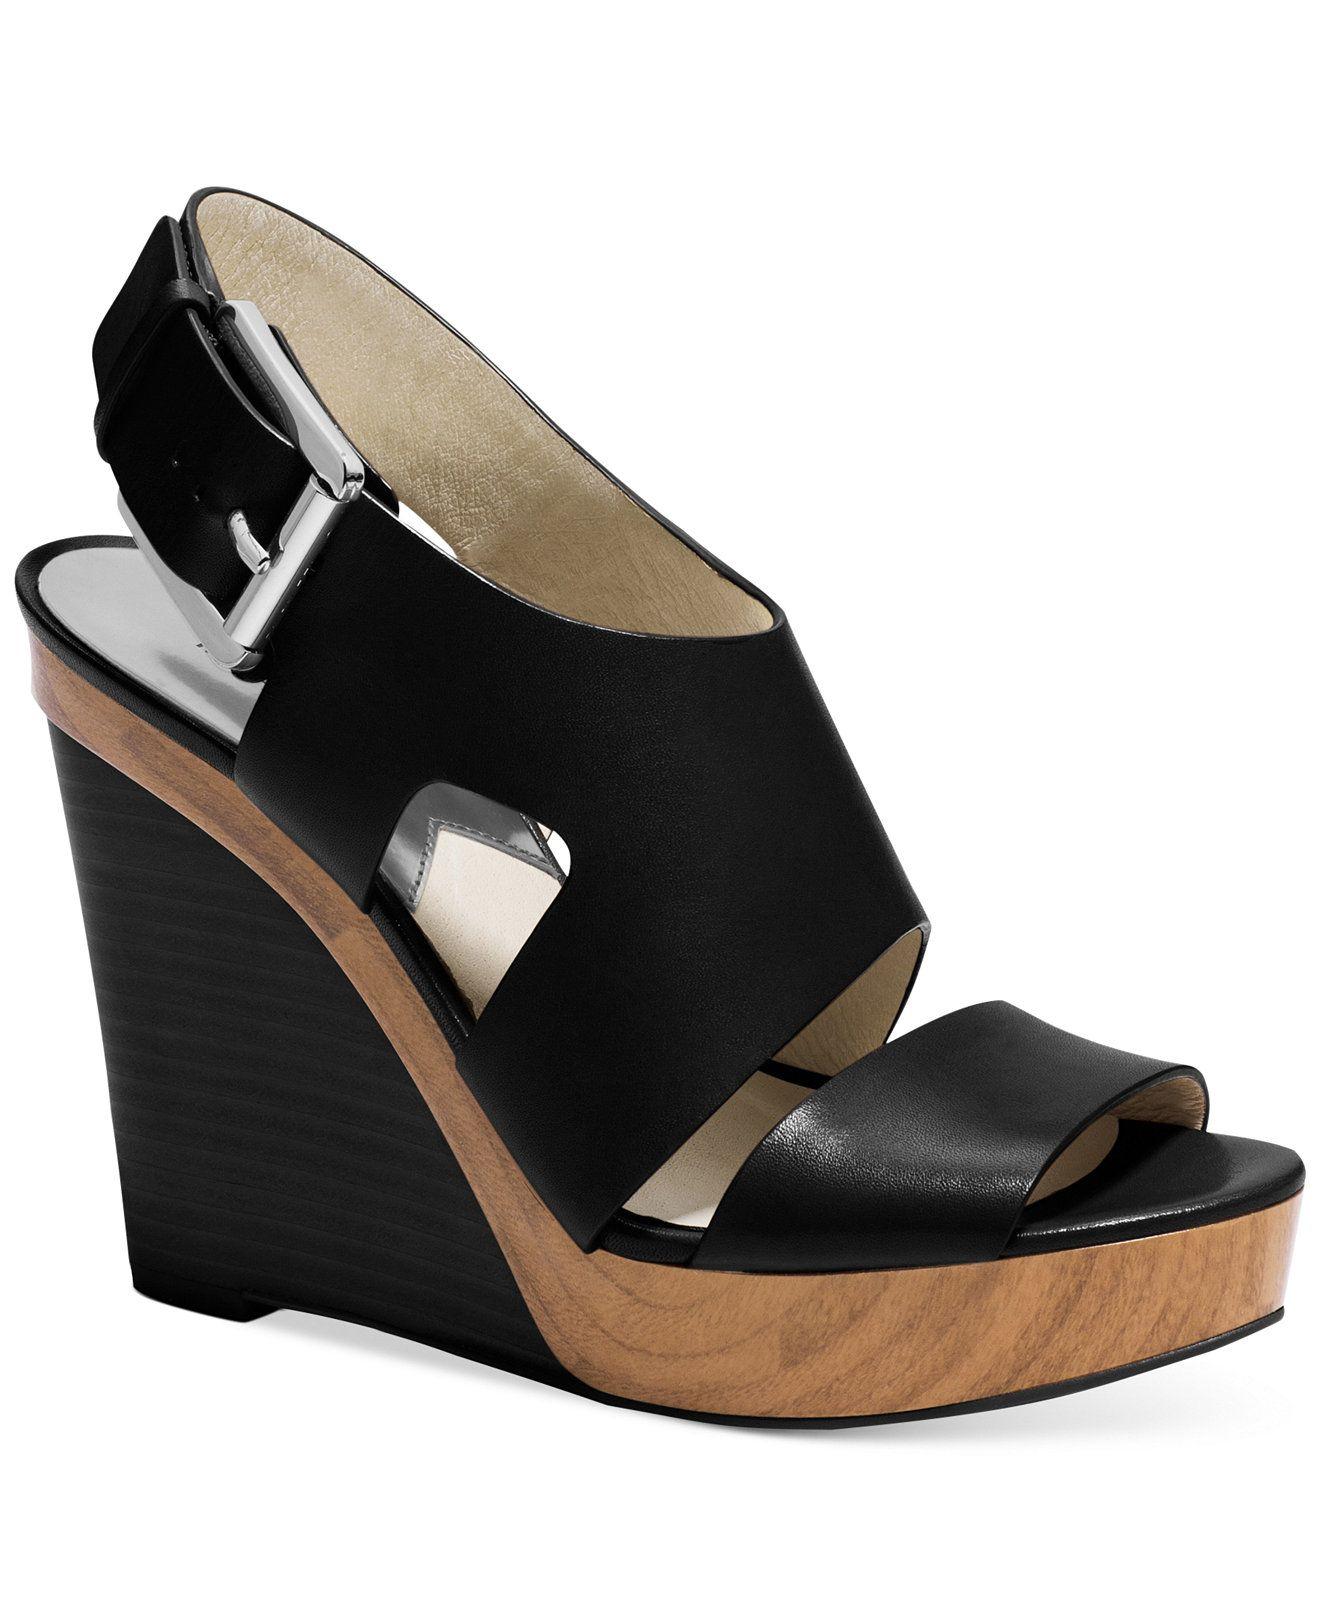 c661ee407084 MICHAEL Michael Kors Carla Platform Wedge Sandals - MICHAEL Michael Kors -  Shoes - Macy s